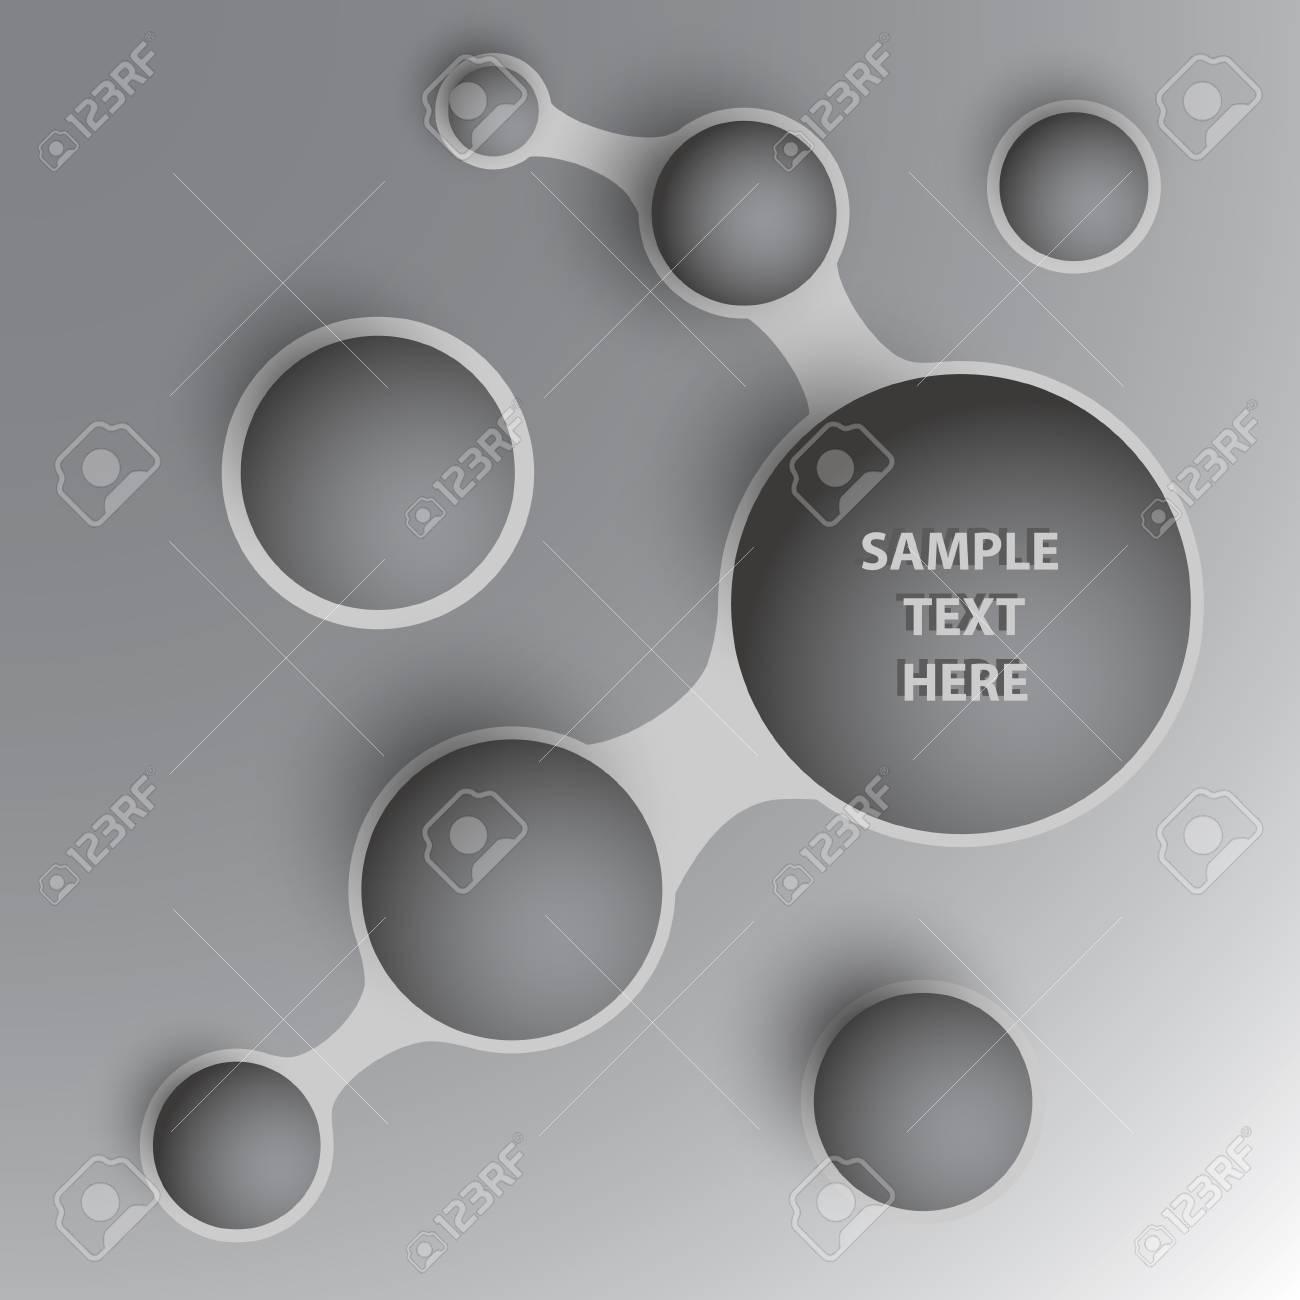 Bubbles 2 Stock Vector - 16937792